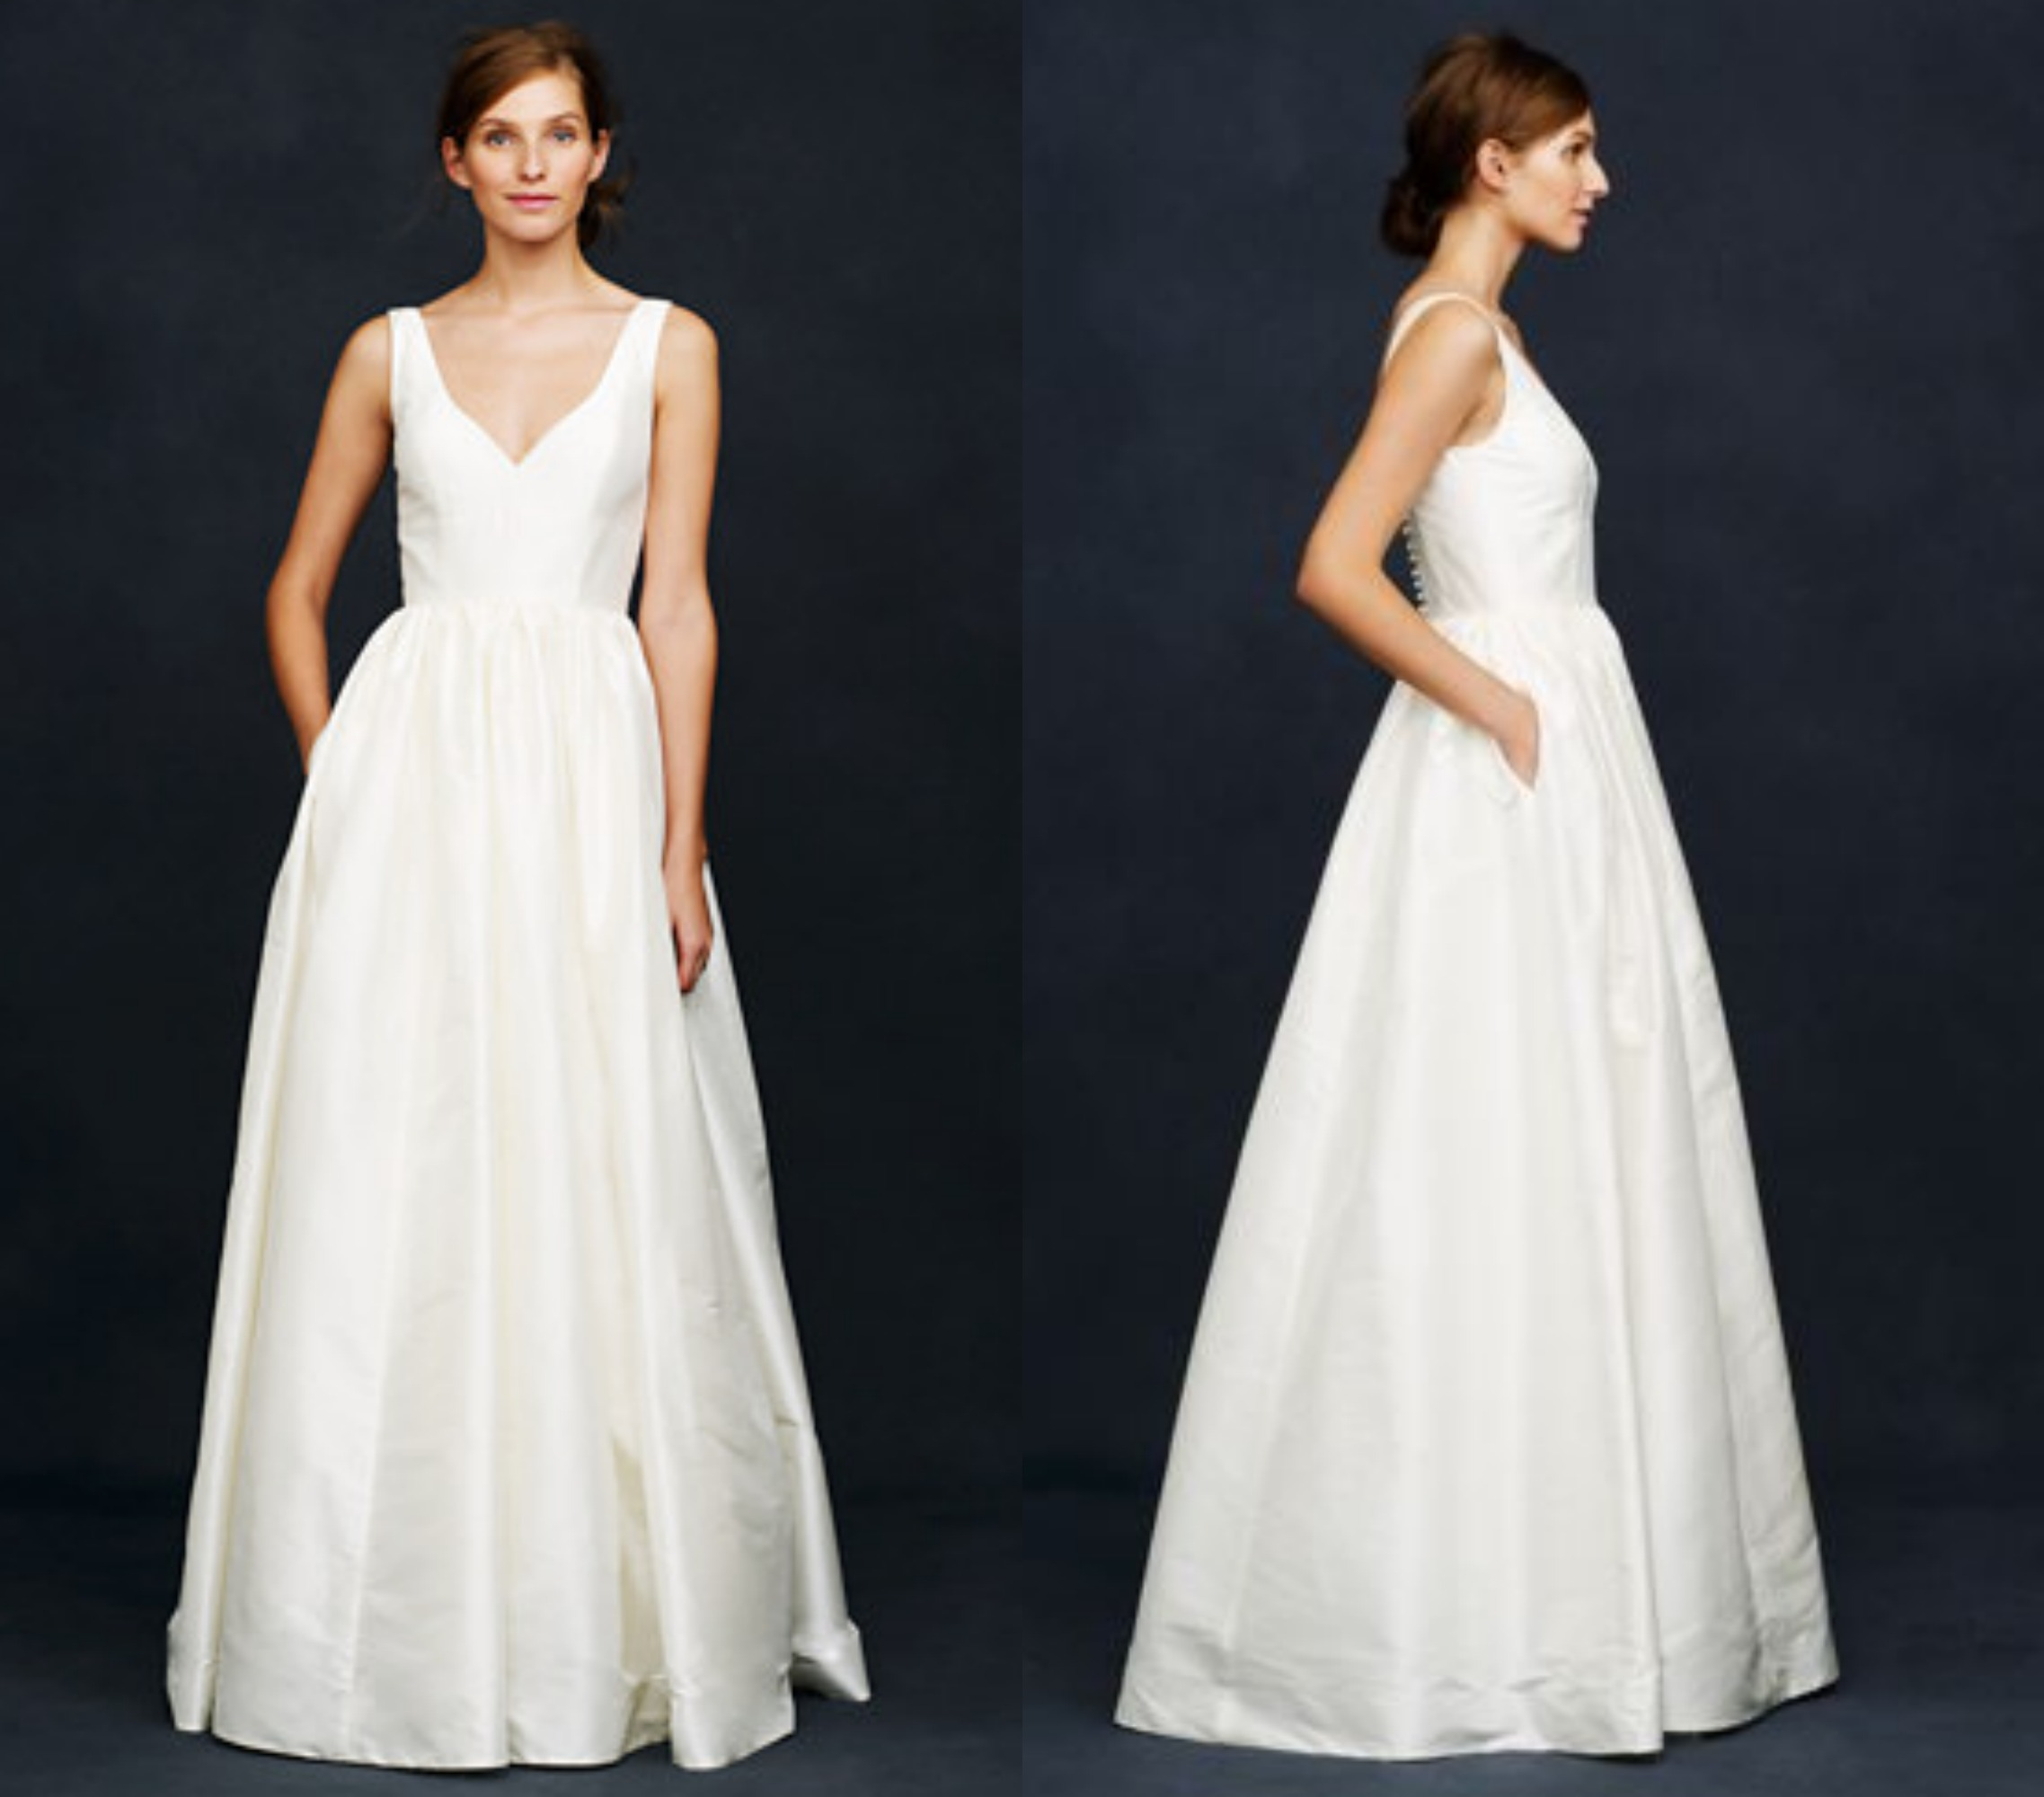 J crew wedding dresses for the preppy bride preppy for J crew dresses wedding